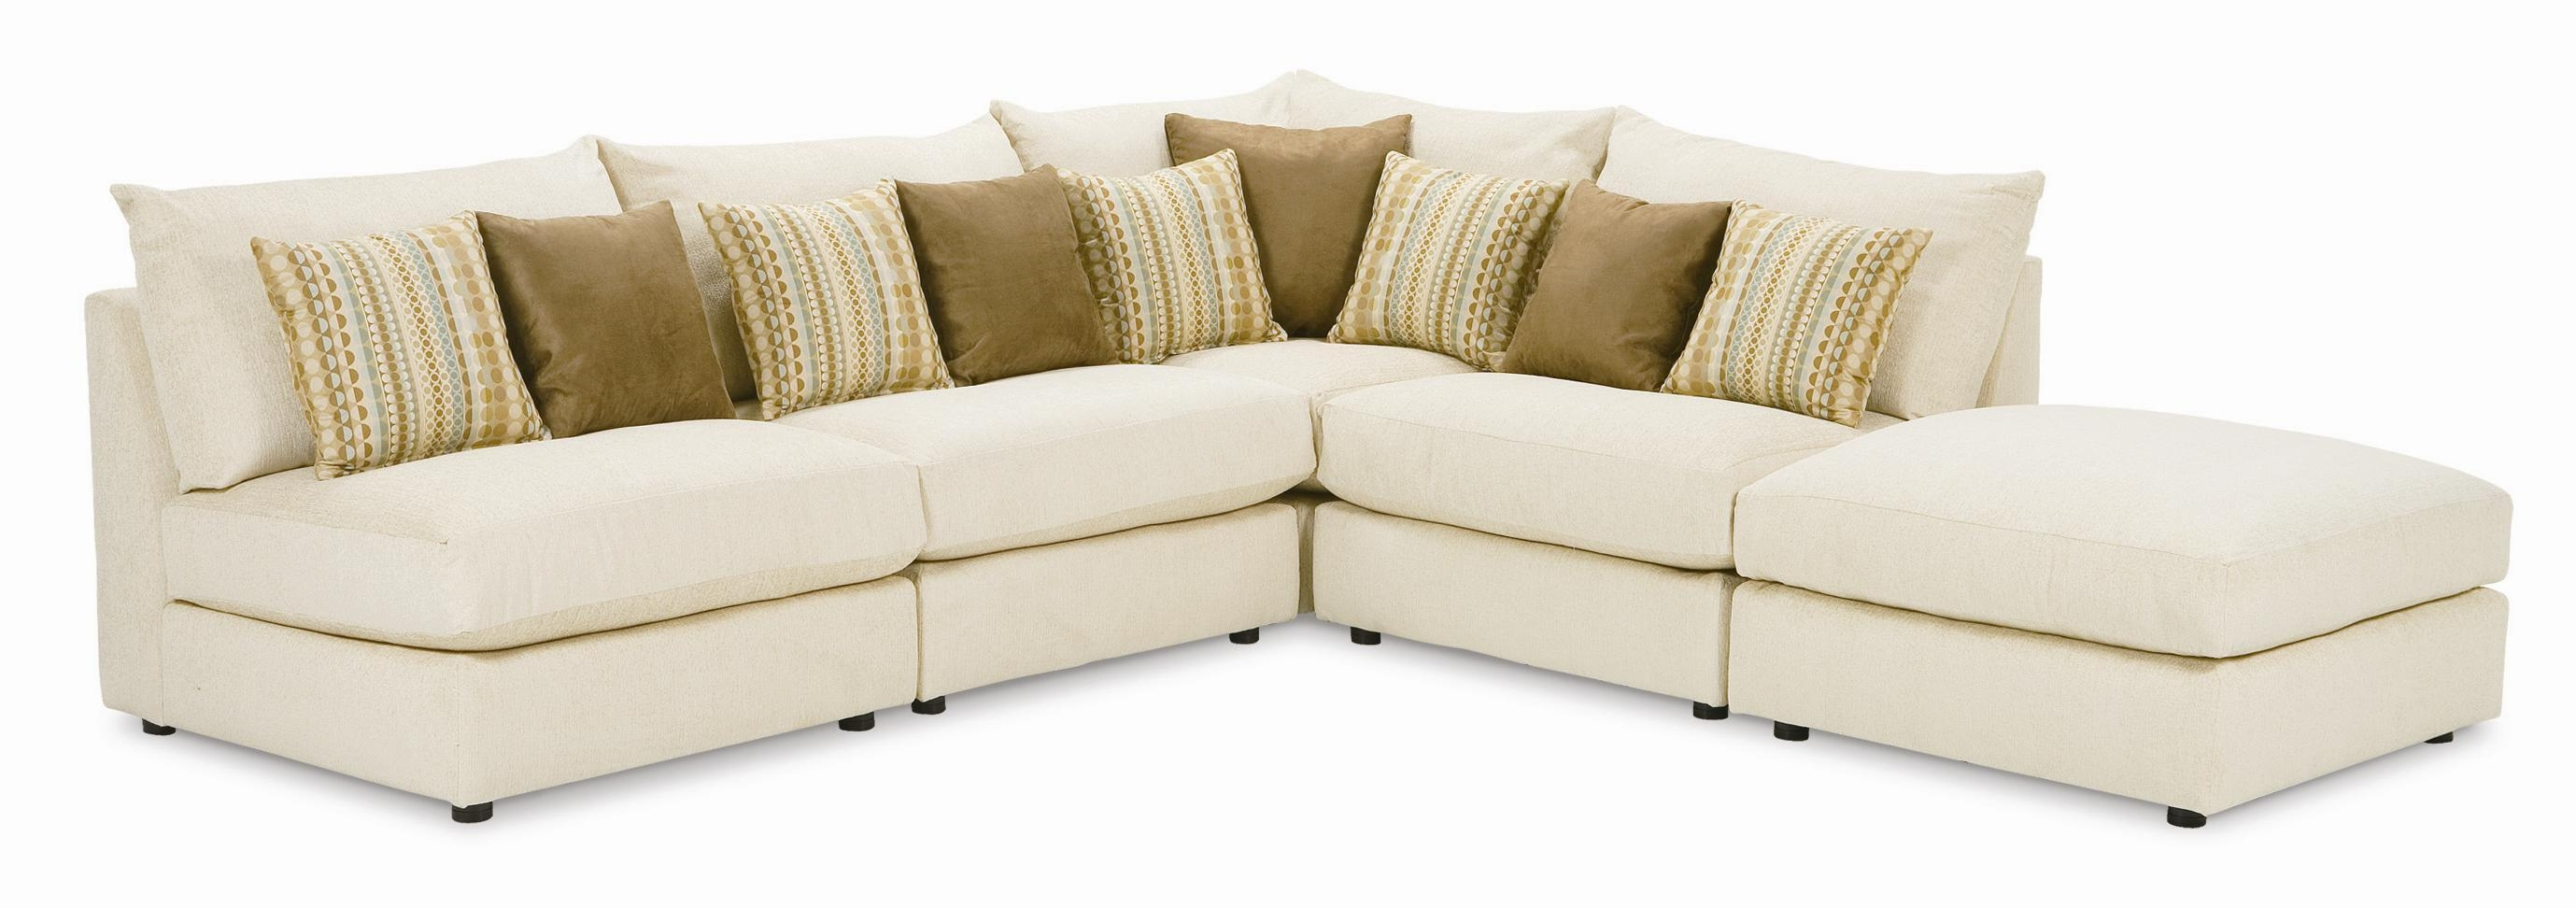 armless sofas sleeper sofa futon 15 43 choices of sectional ideas